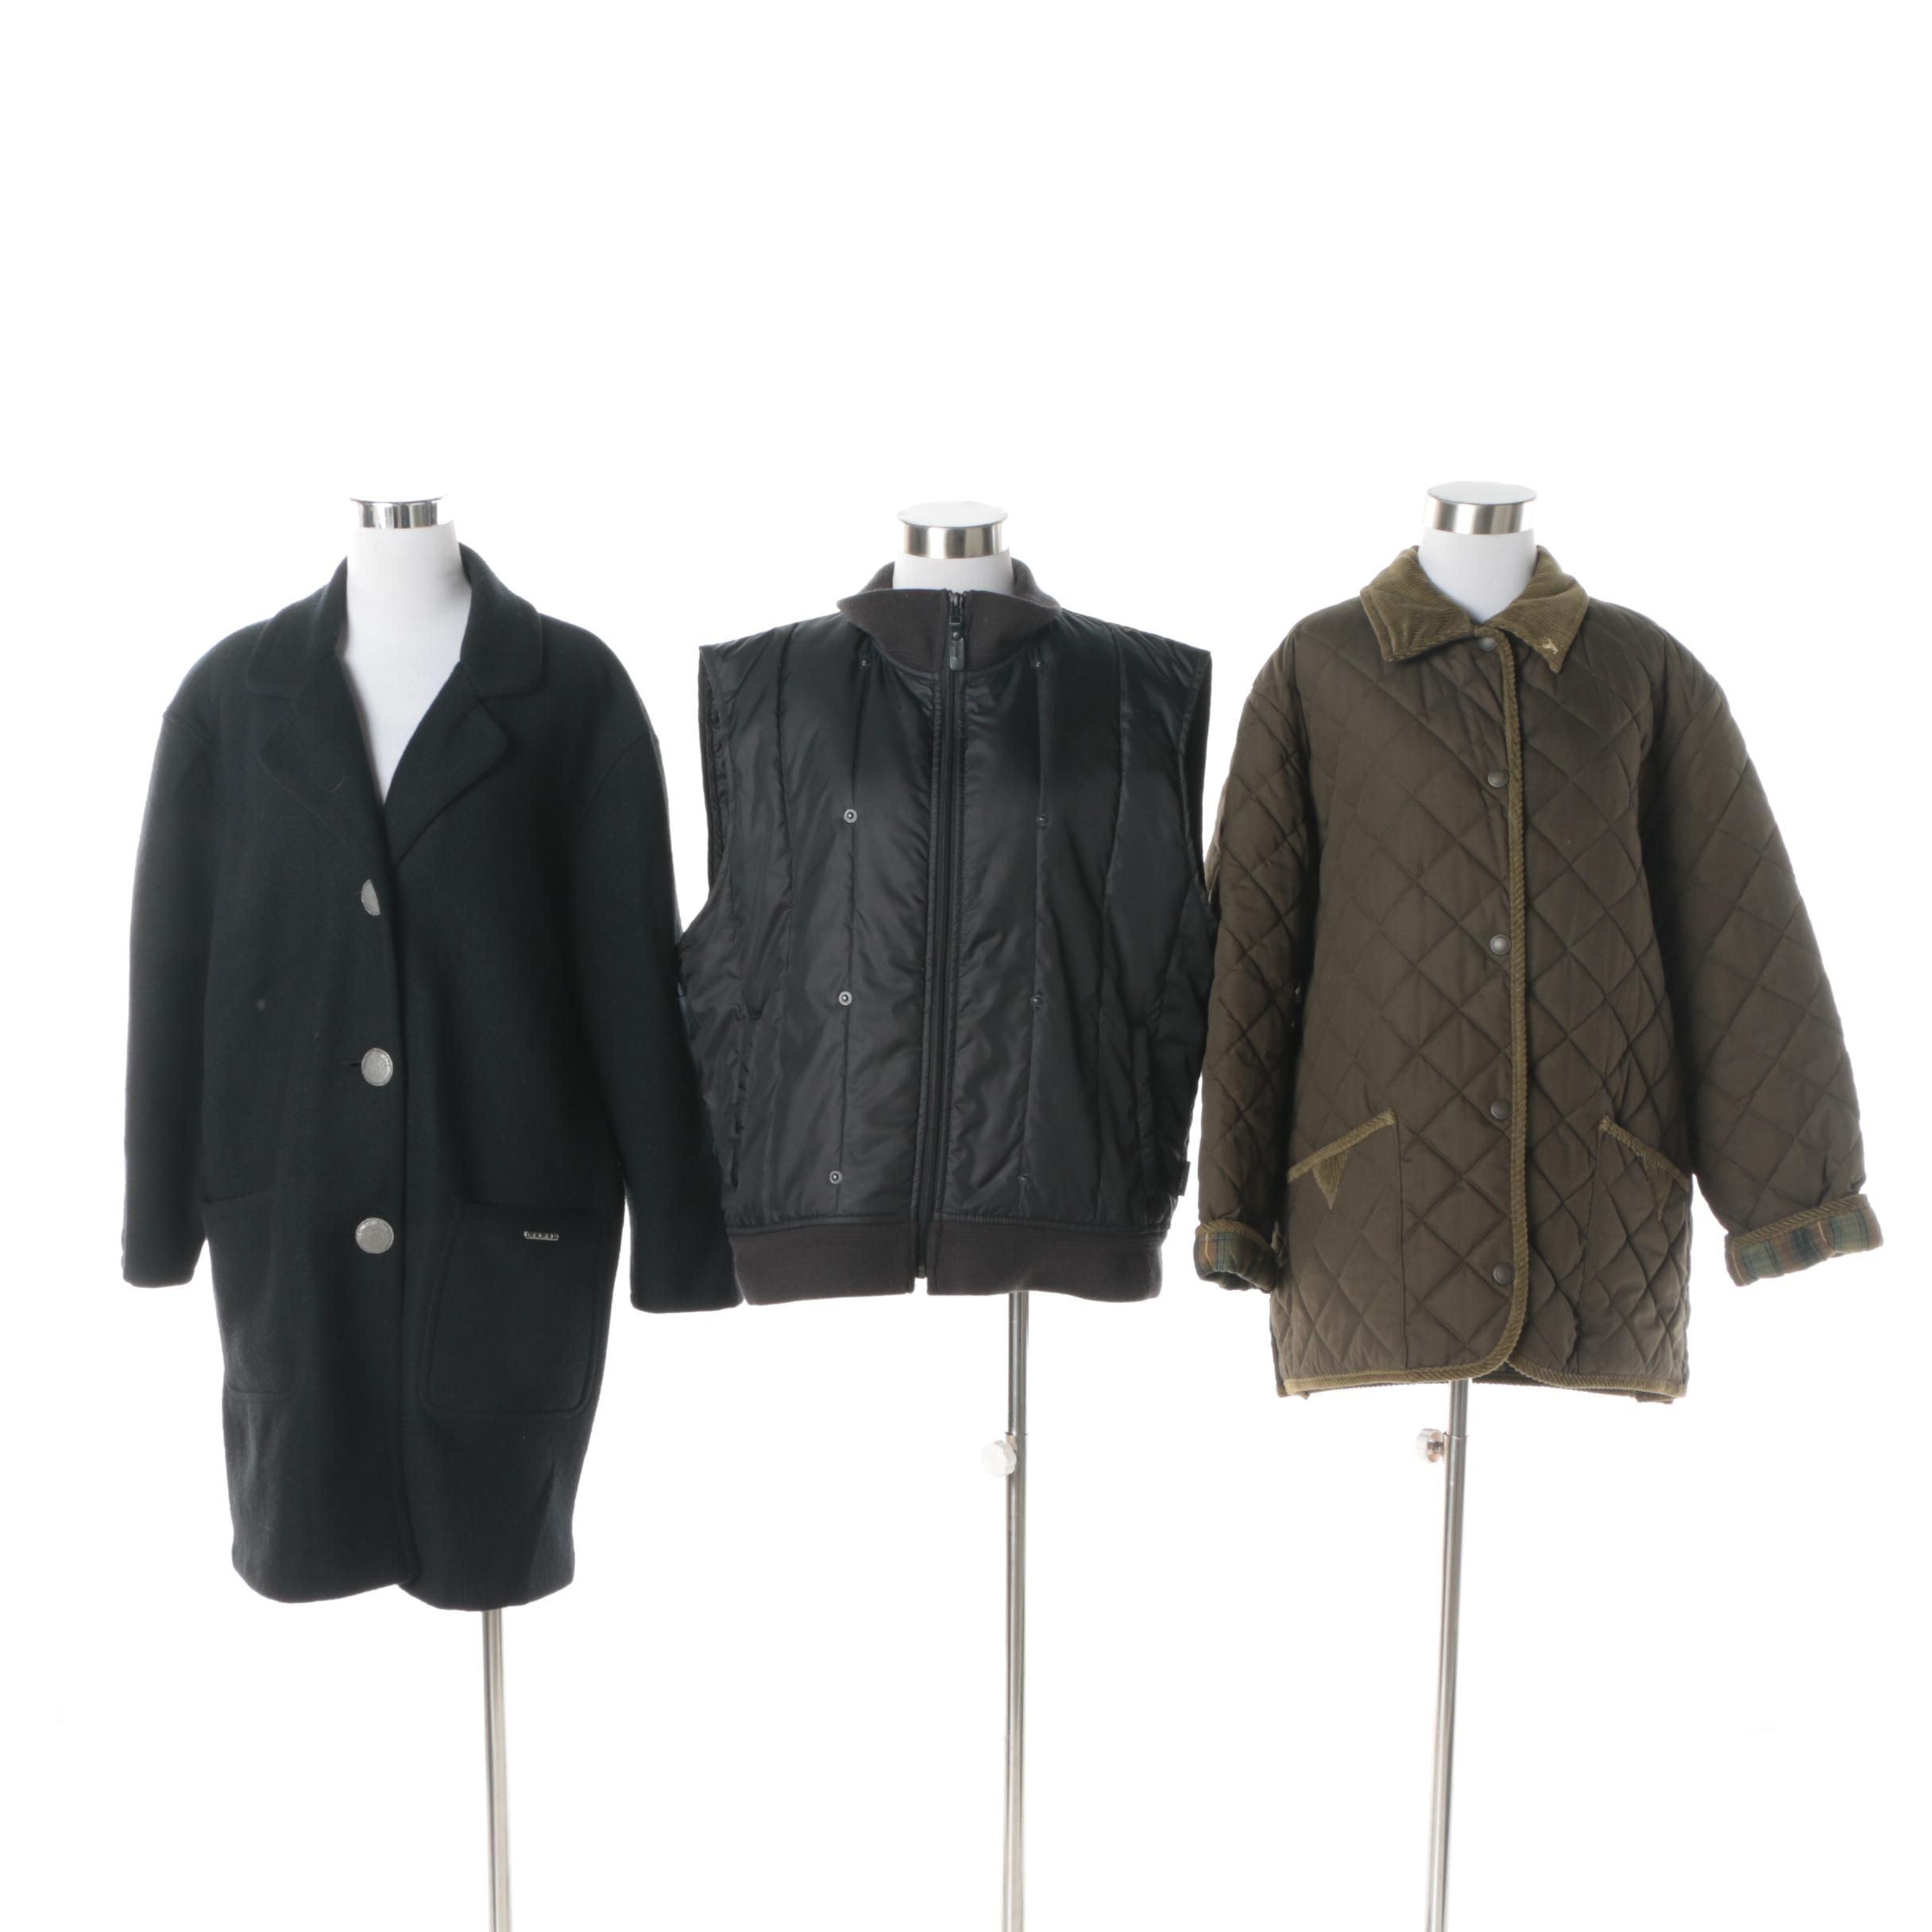 Women's John Partridge, Geiger and Polo by Ralph Lauren Outerwear